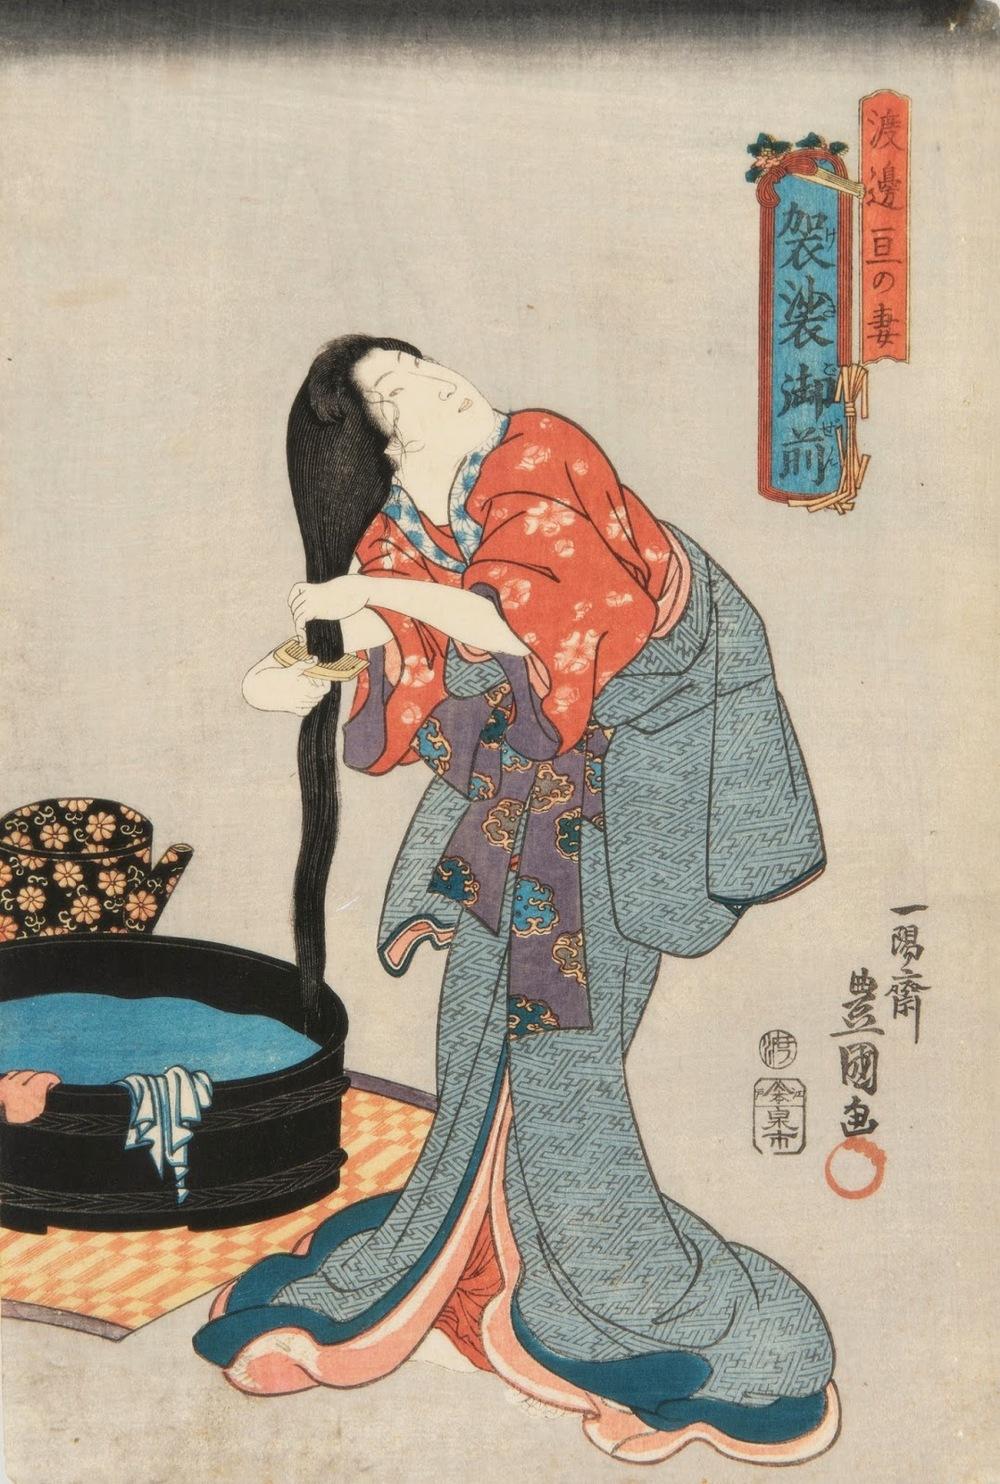 Utagawa Kunisada,  Kesa Gozen, esposa de Watanabe Wataru  (1843-1847)